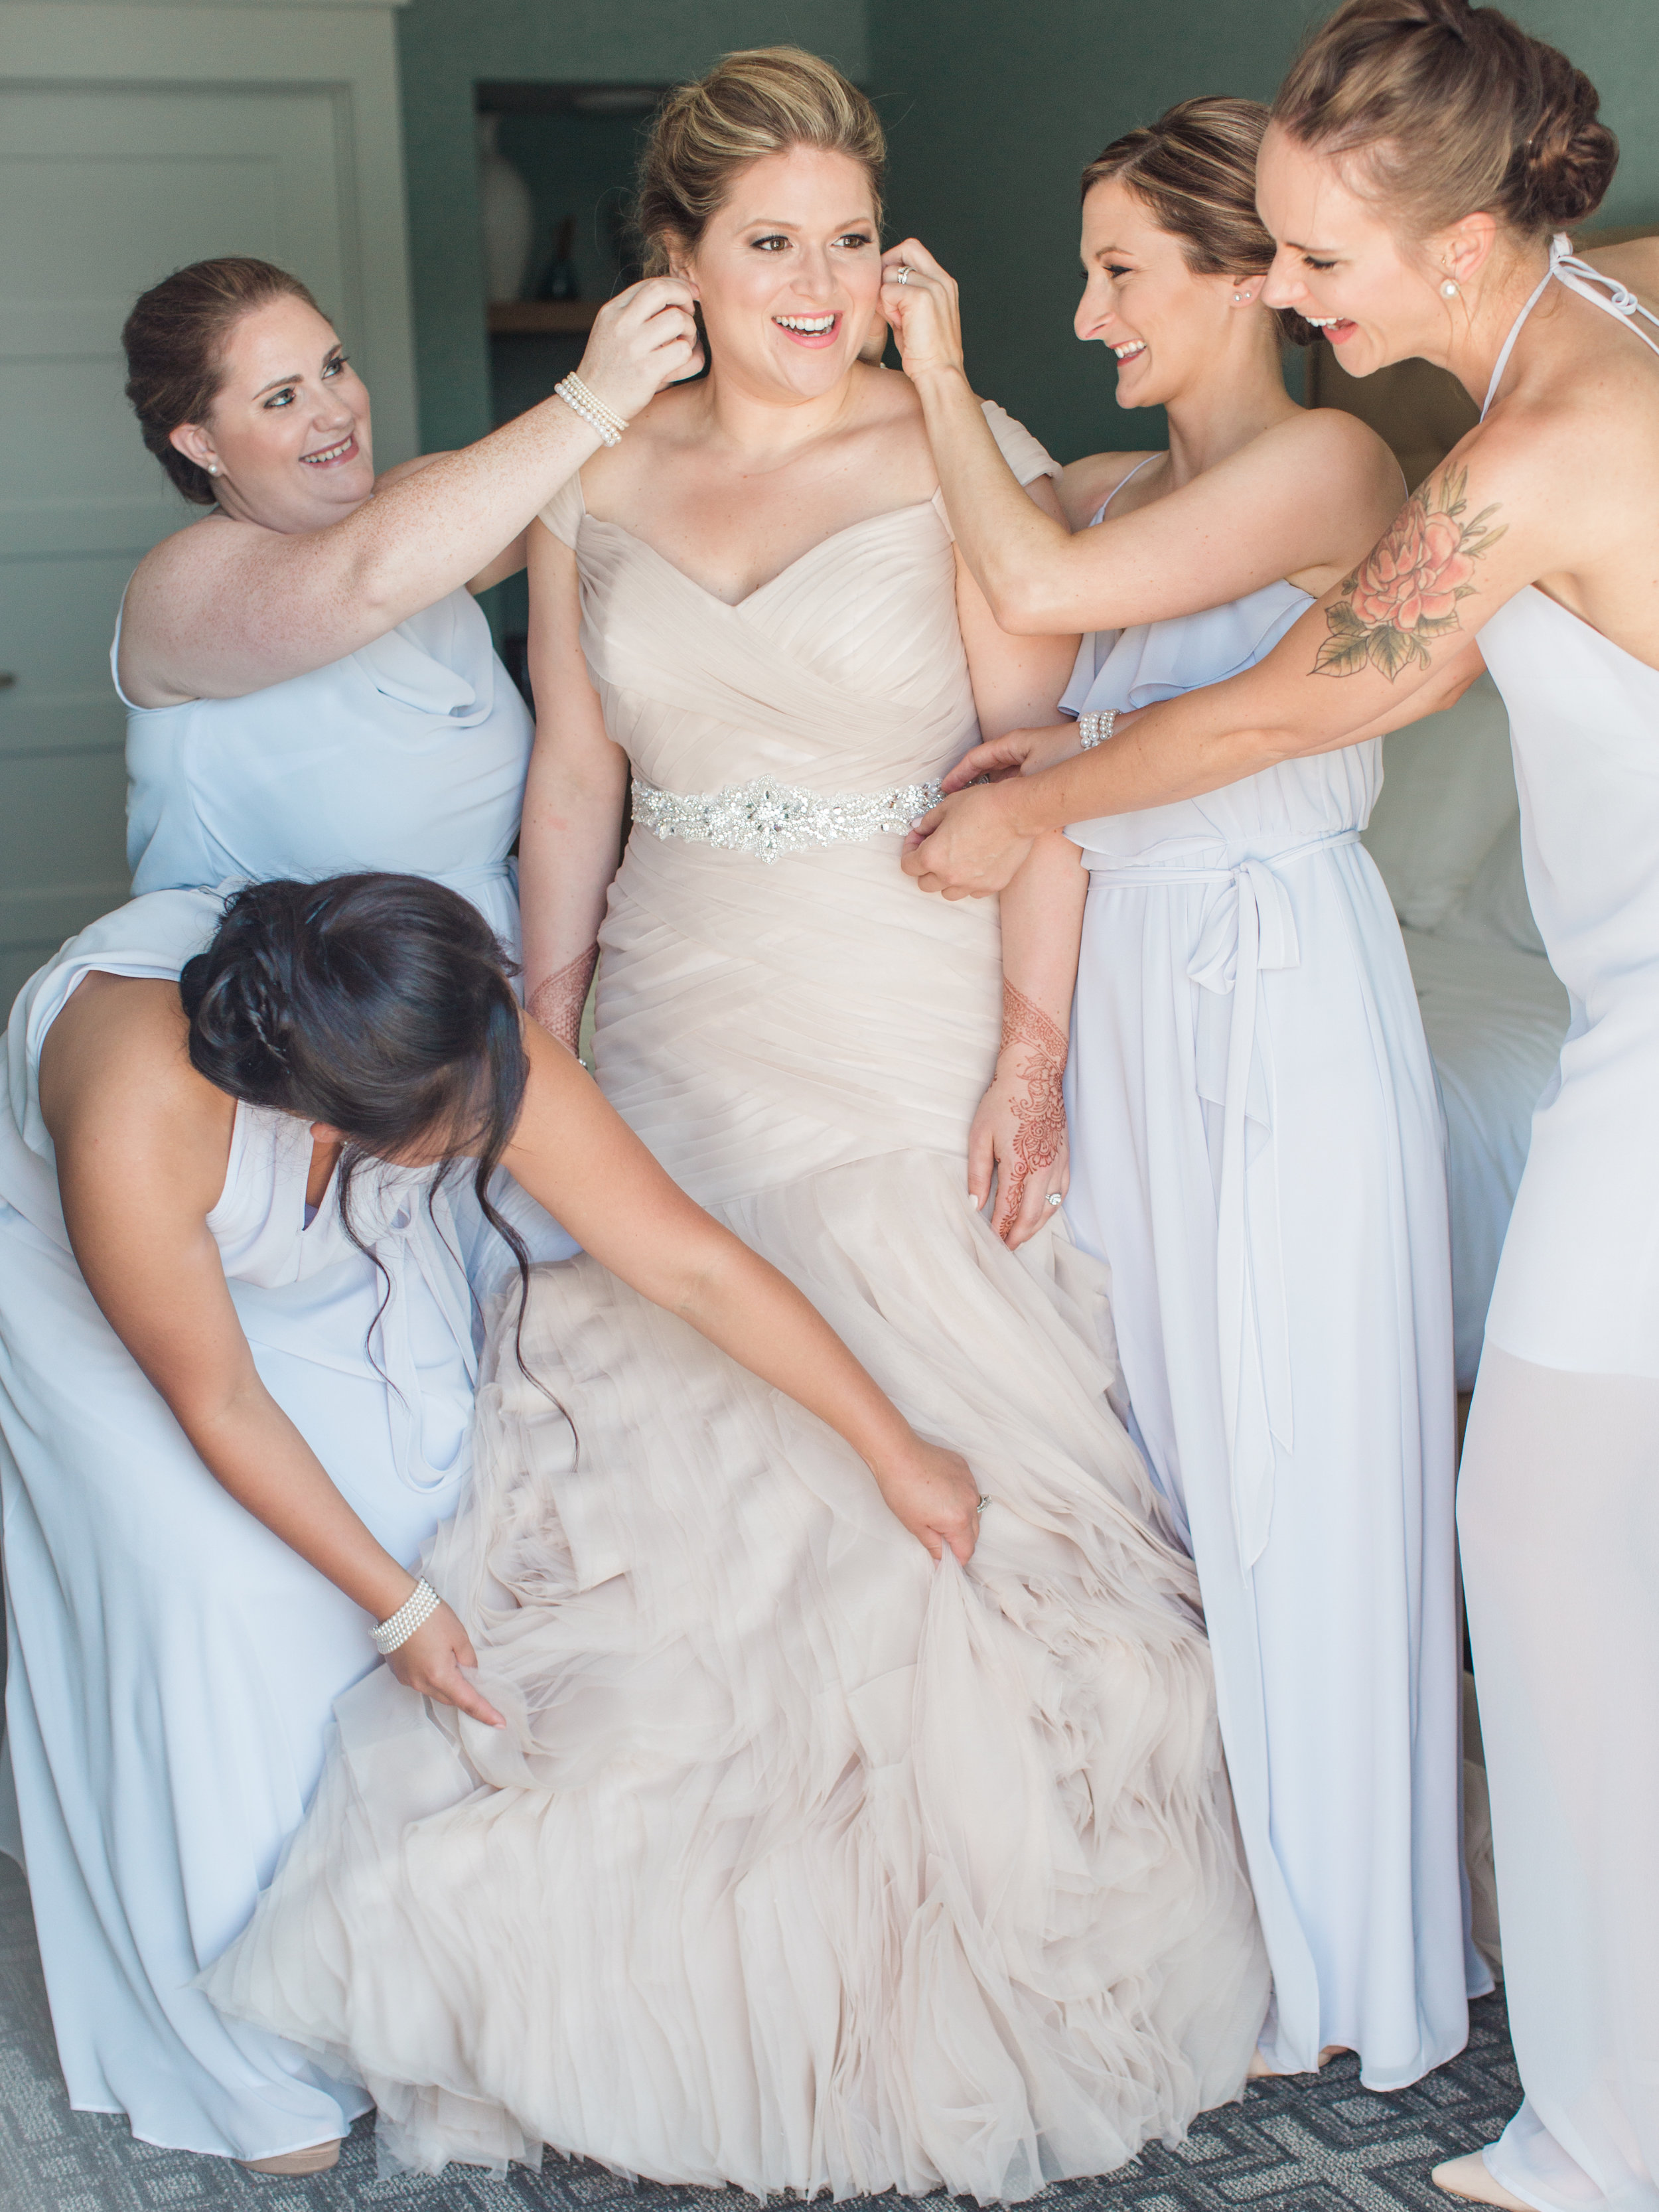 Govathoti+Wedding+Getting+Ready-83.jpg